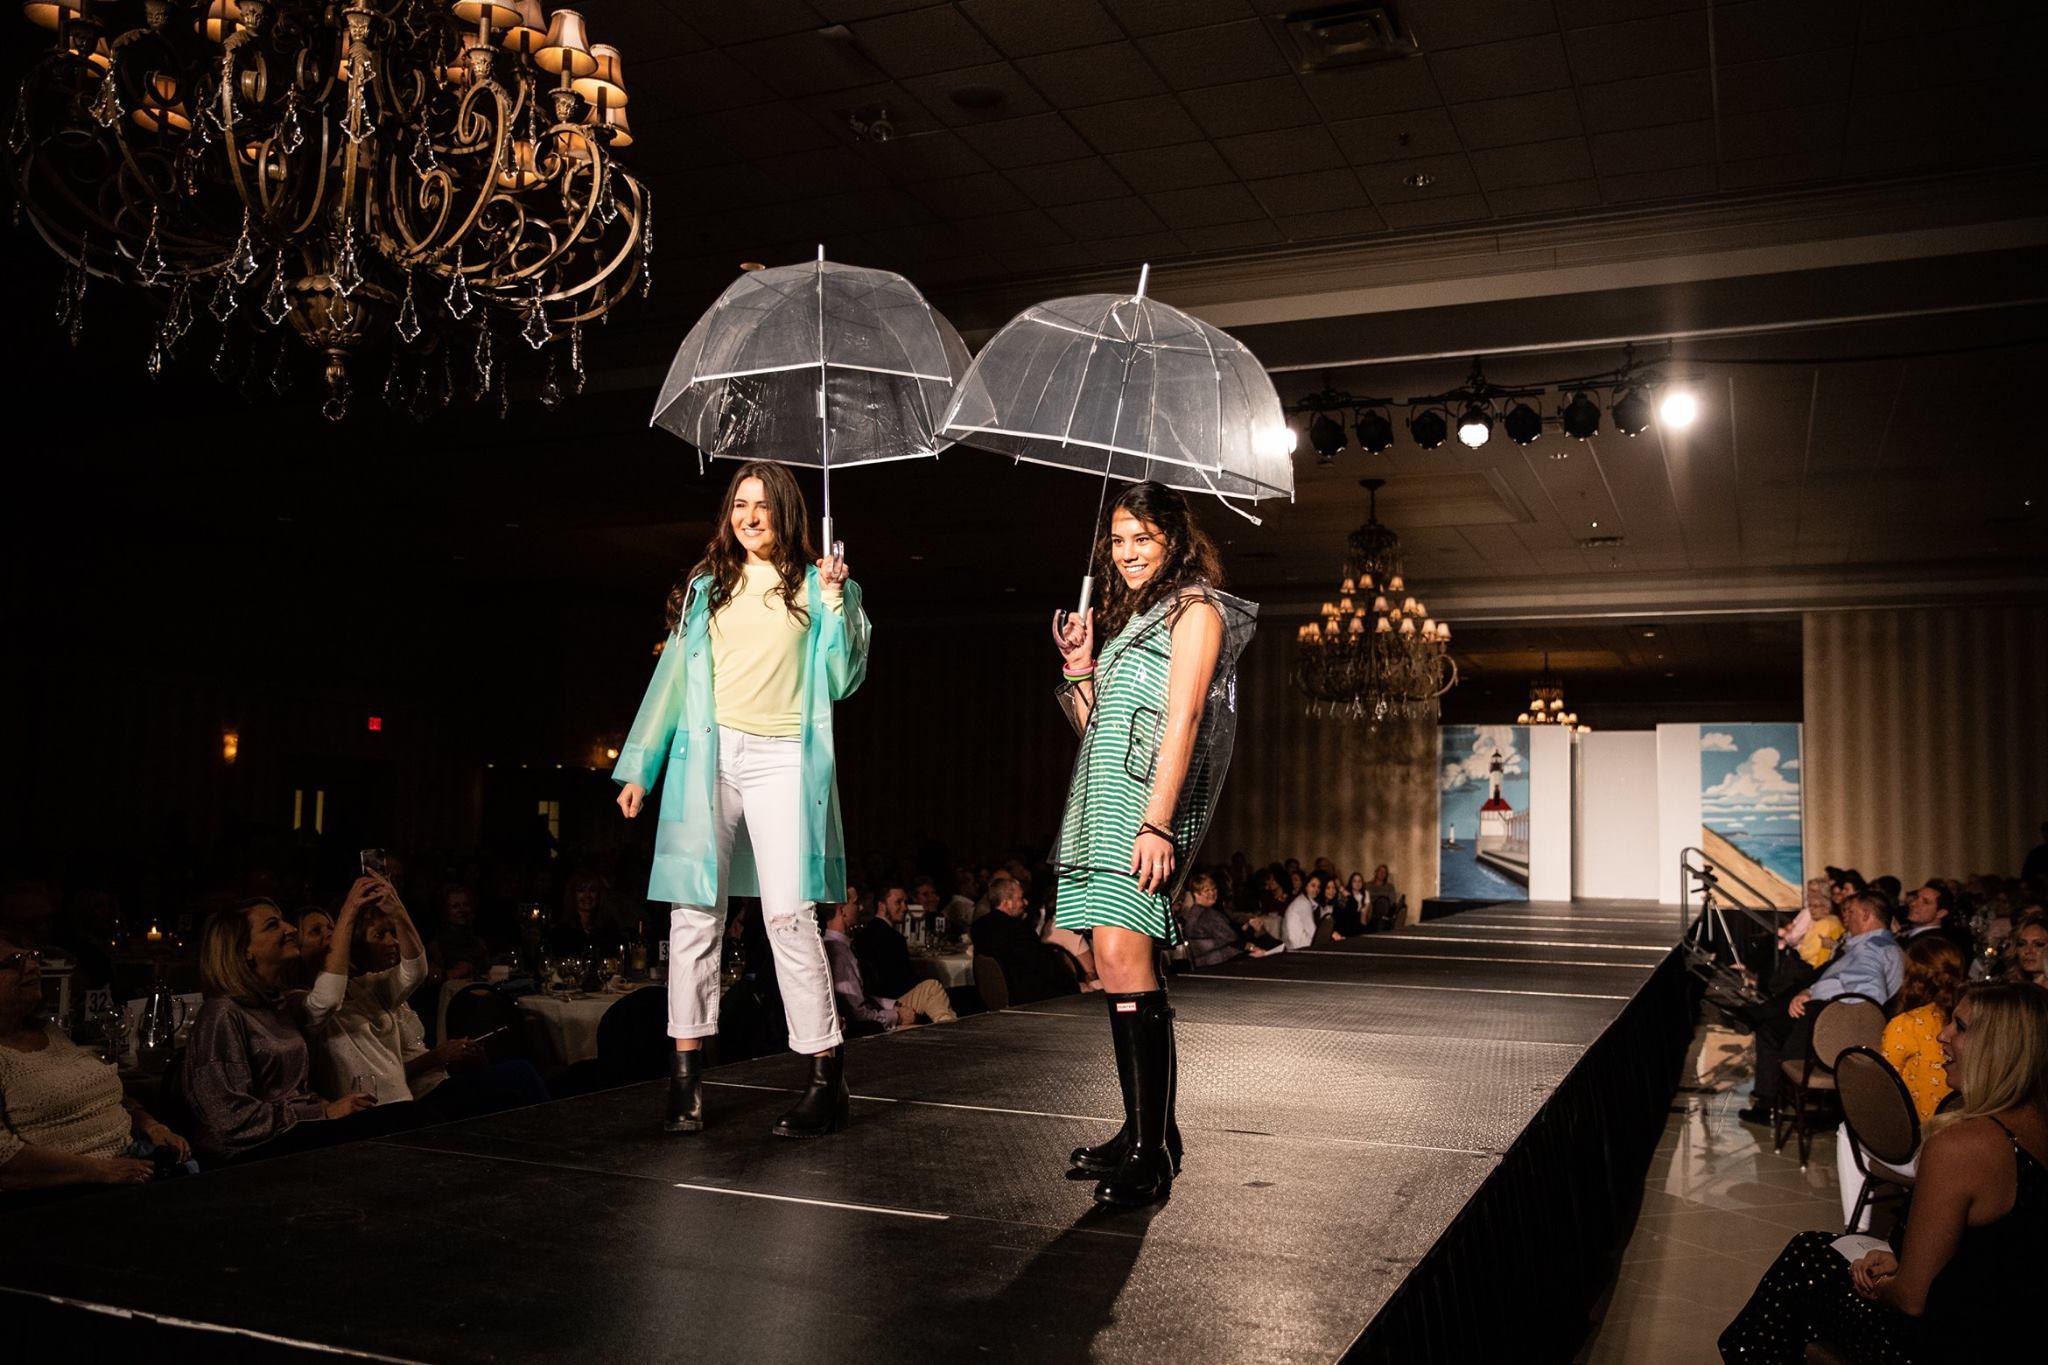 Lutheran_North_High_School_Macomb_Michigan_LHN_Fashion_Show_2019 (1).jpg